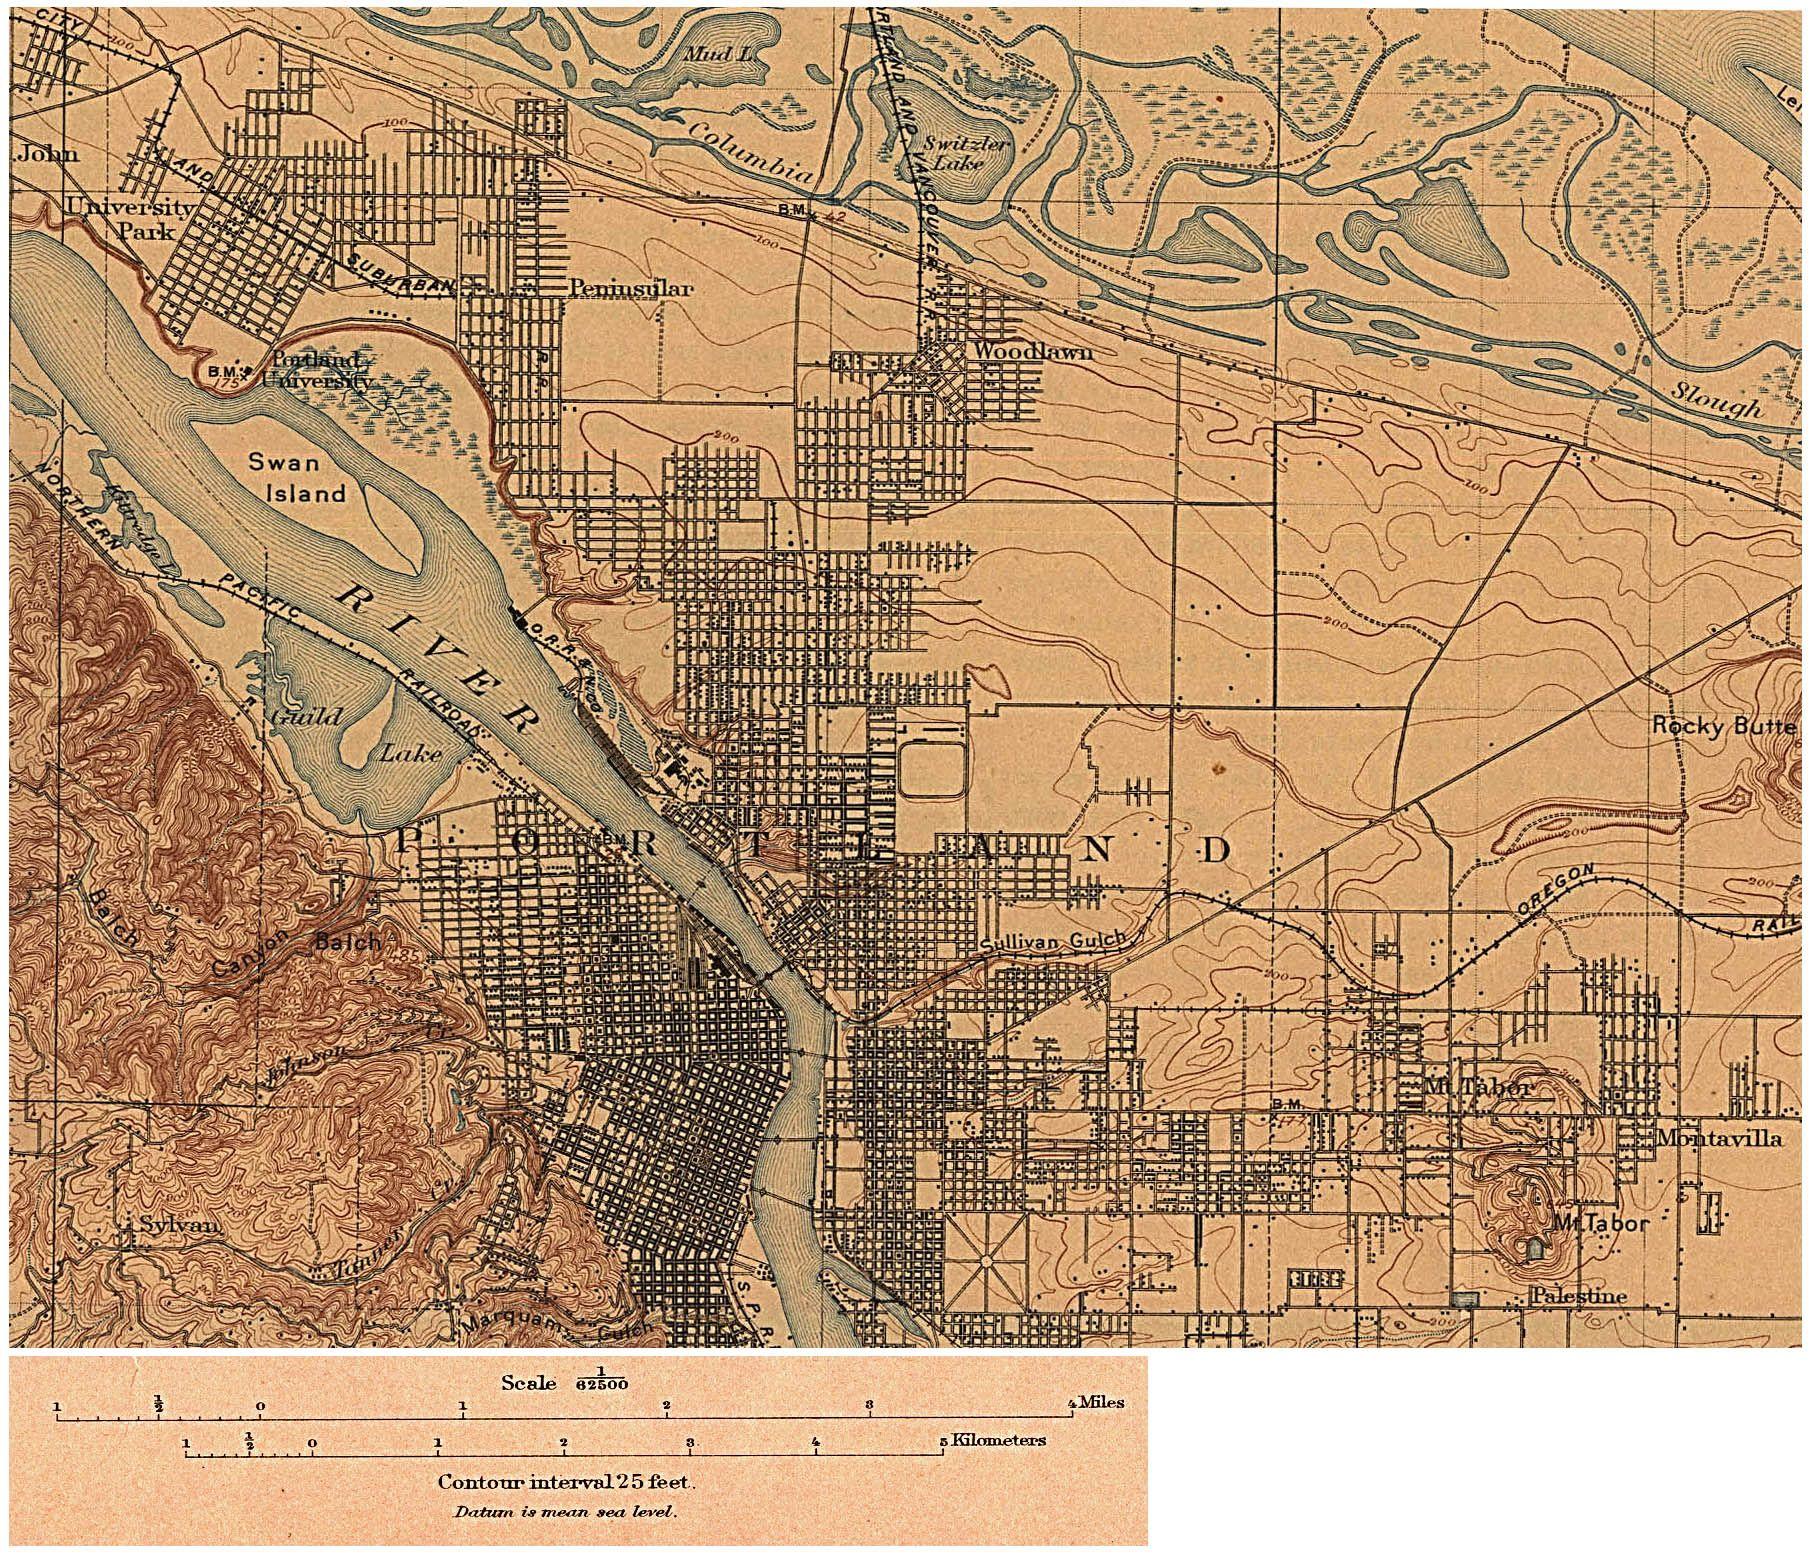 Portland Oregon Map Of Neighborhoods.1897 Portland A Railroad Where The Banfield Now Runs And Not Even